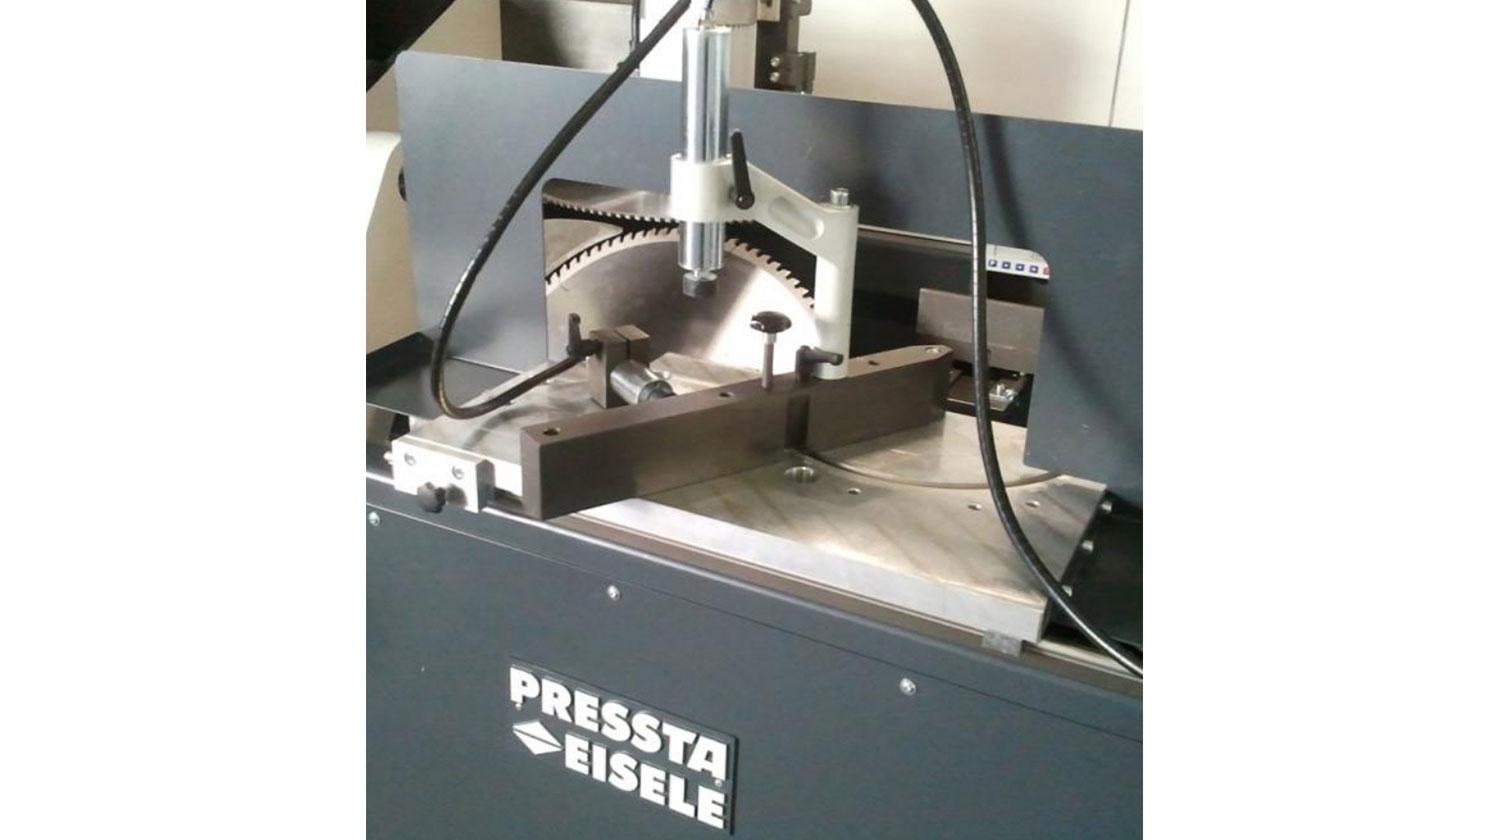 INT aluminum notching saw Pressta Eisele Prisma 500 profile side reference